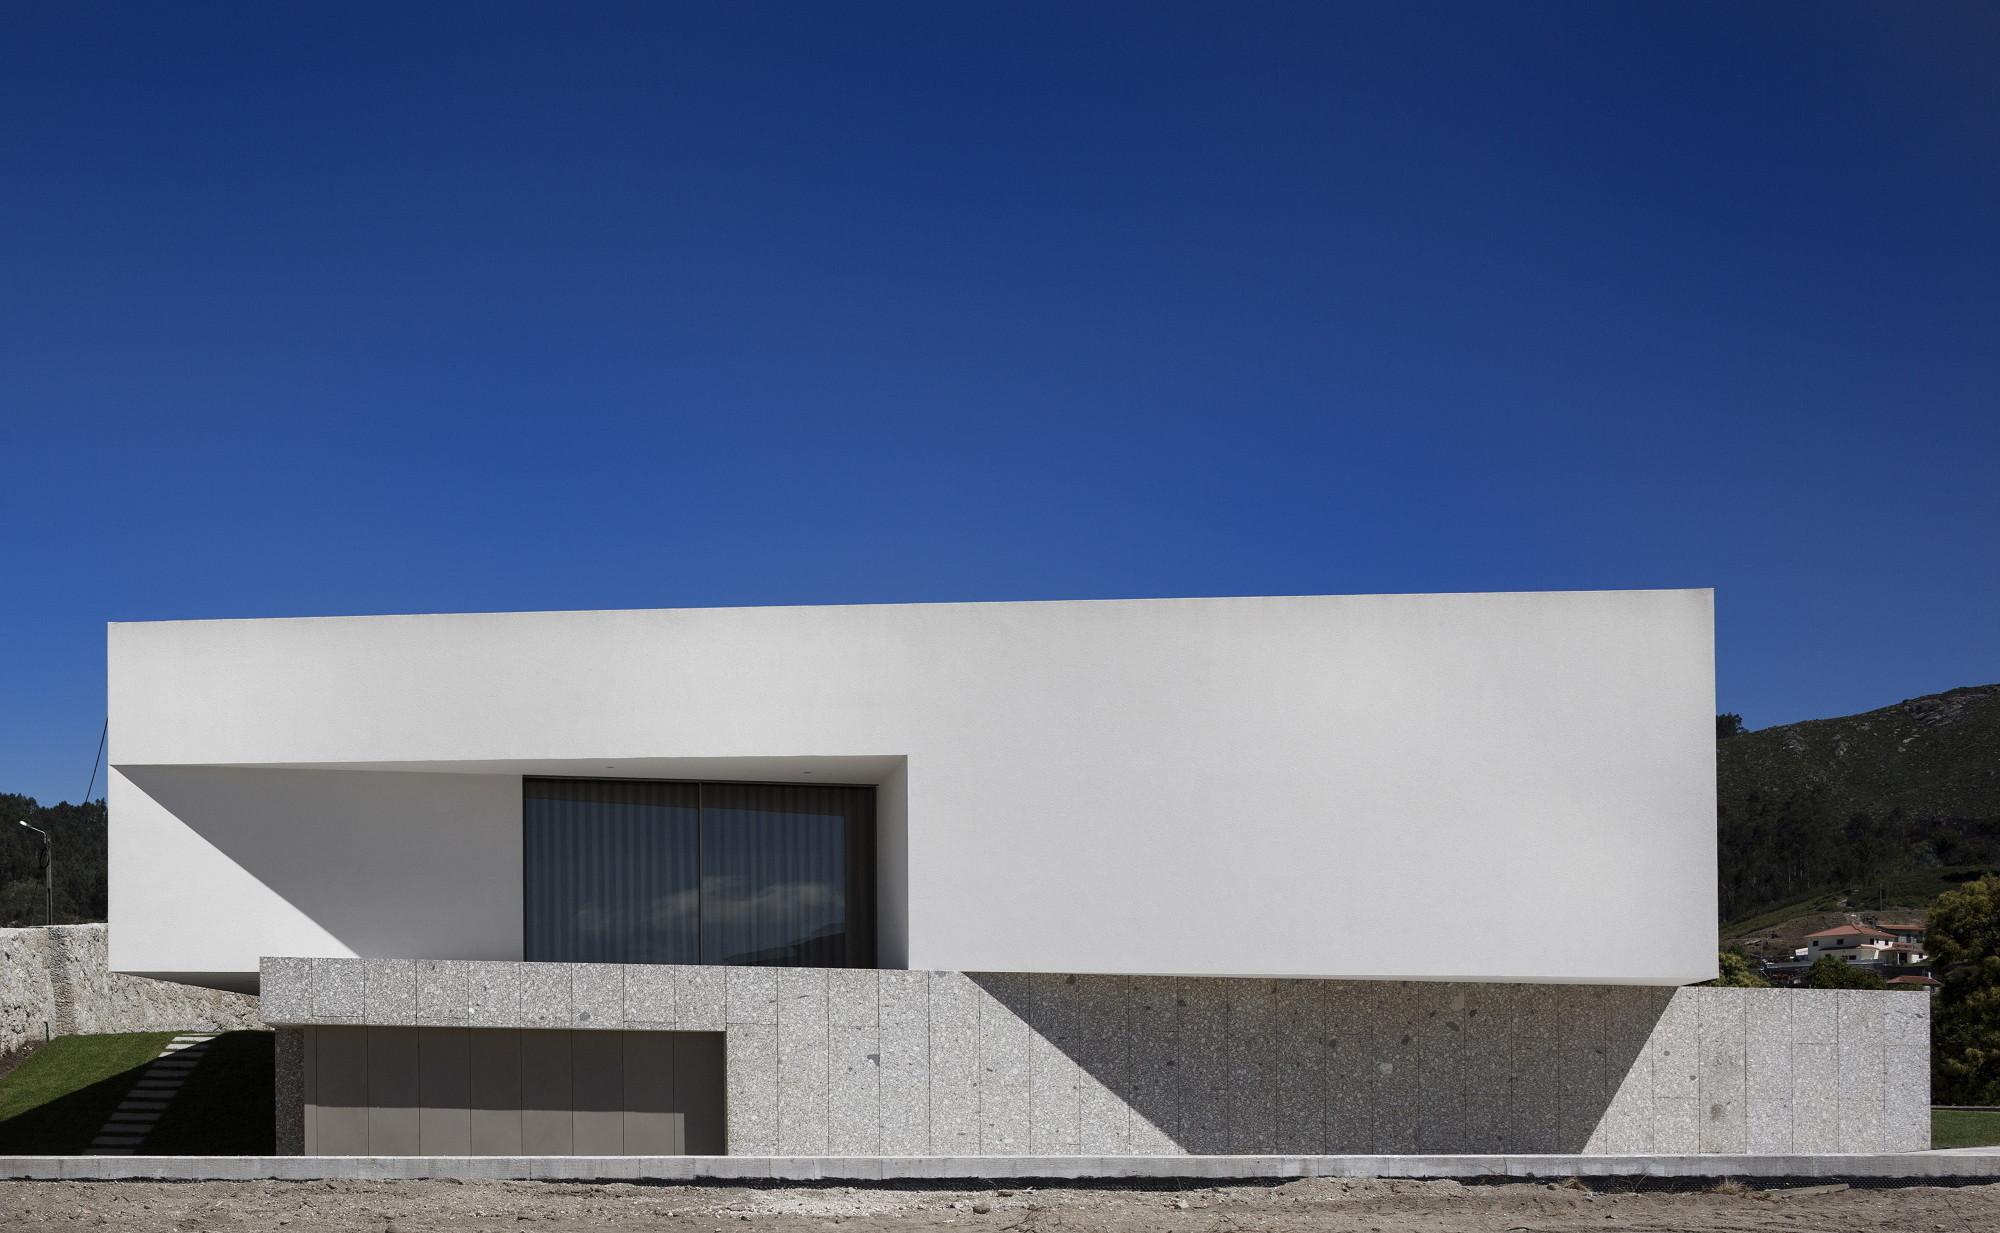 Brunhais House | Rui Vieira Oliveira